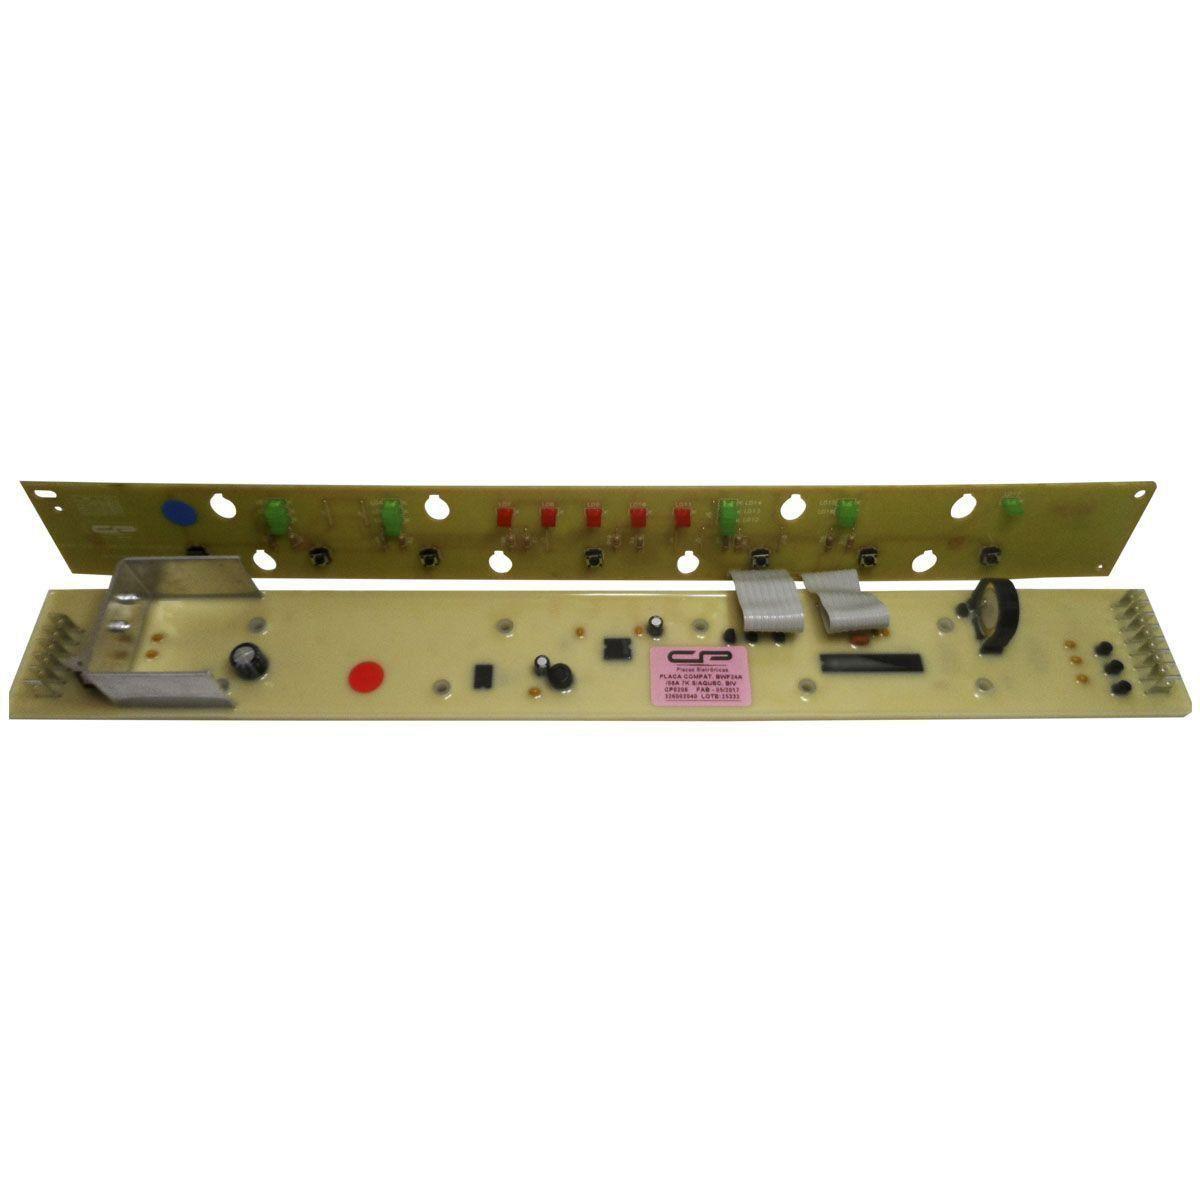 Placa Eletrônica Potência e Interface Lavadora Brastemp 7Kg